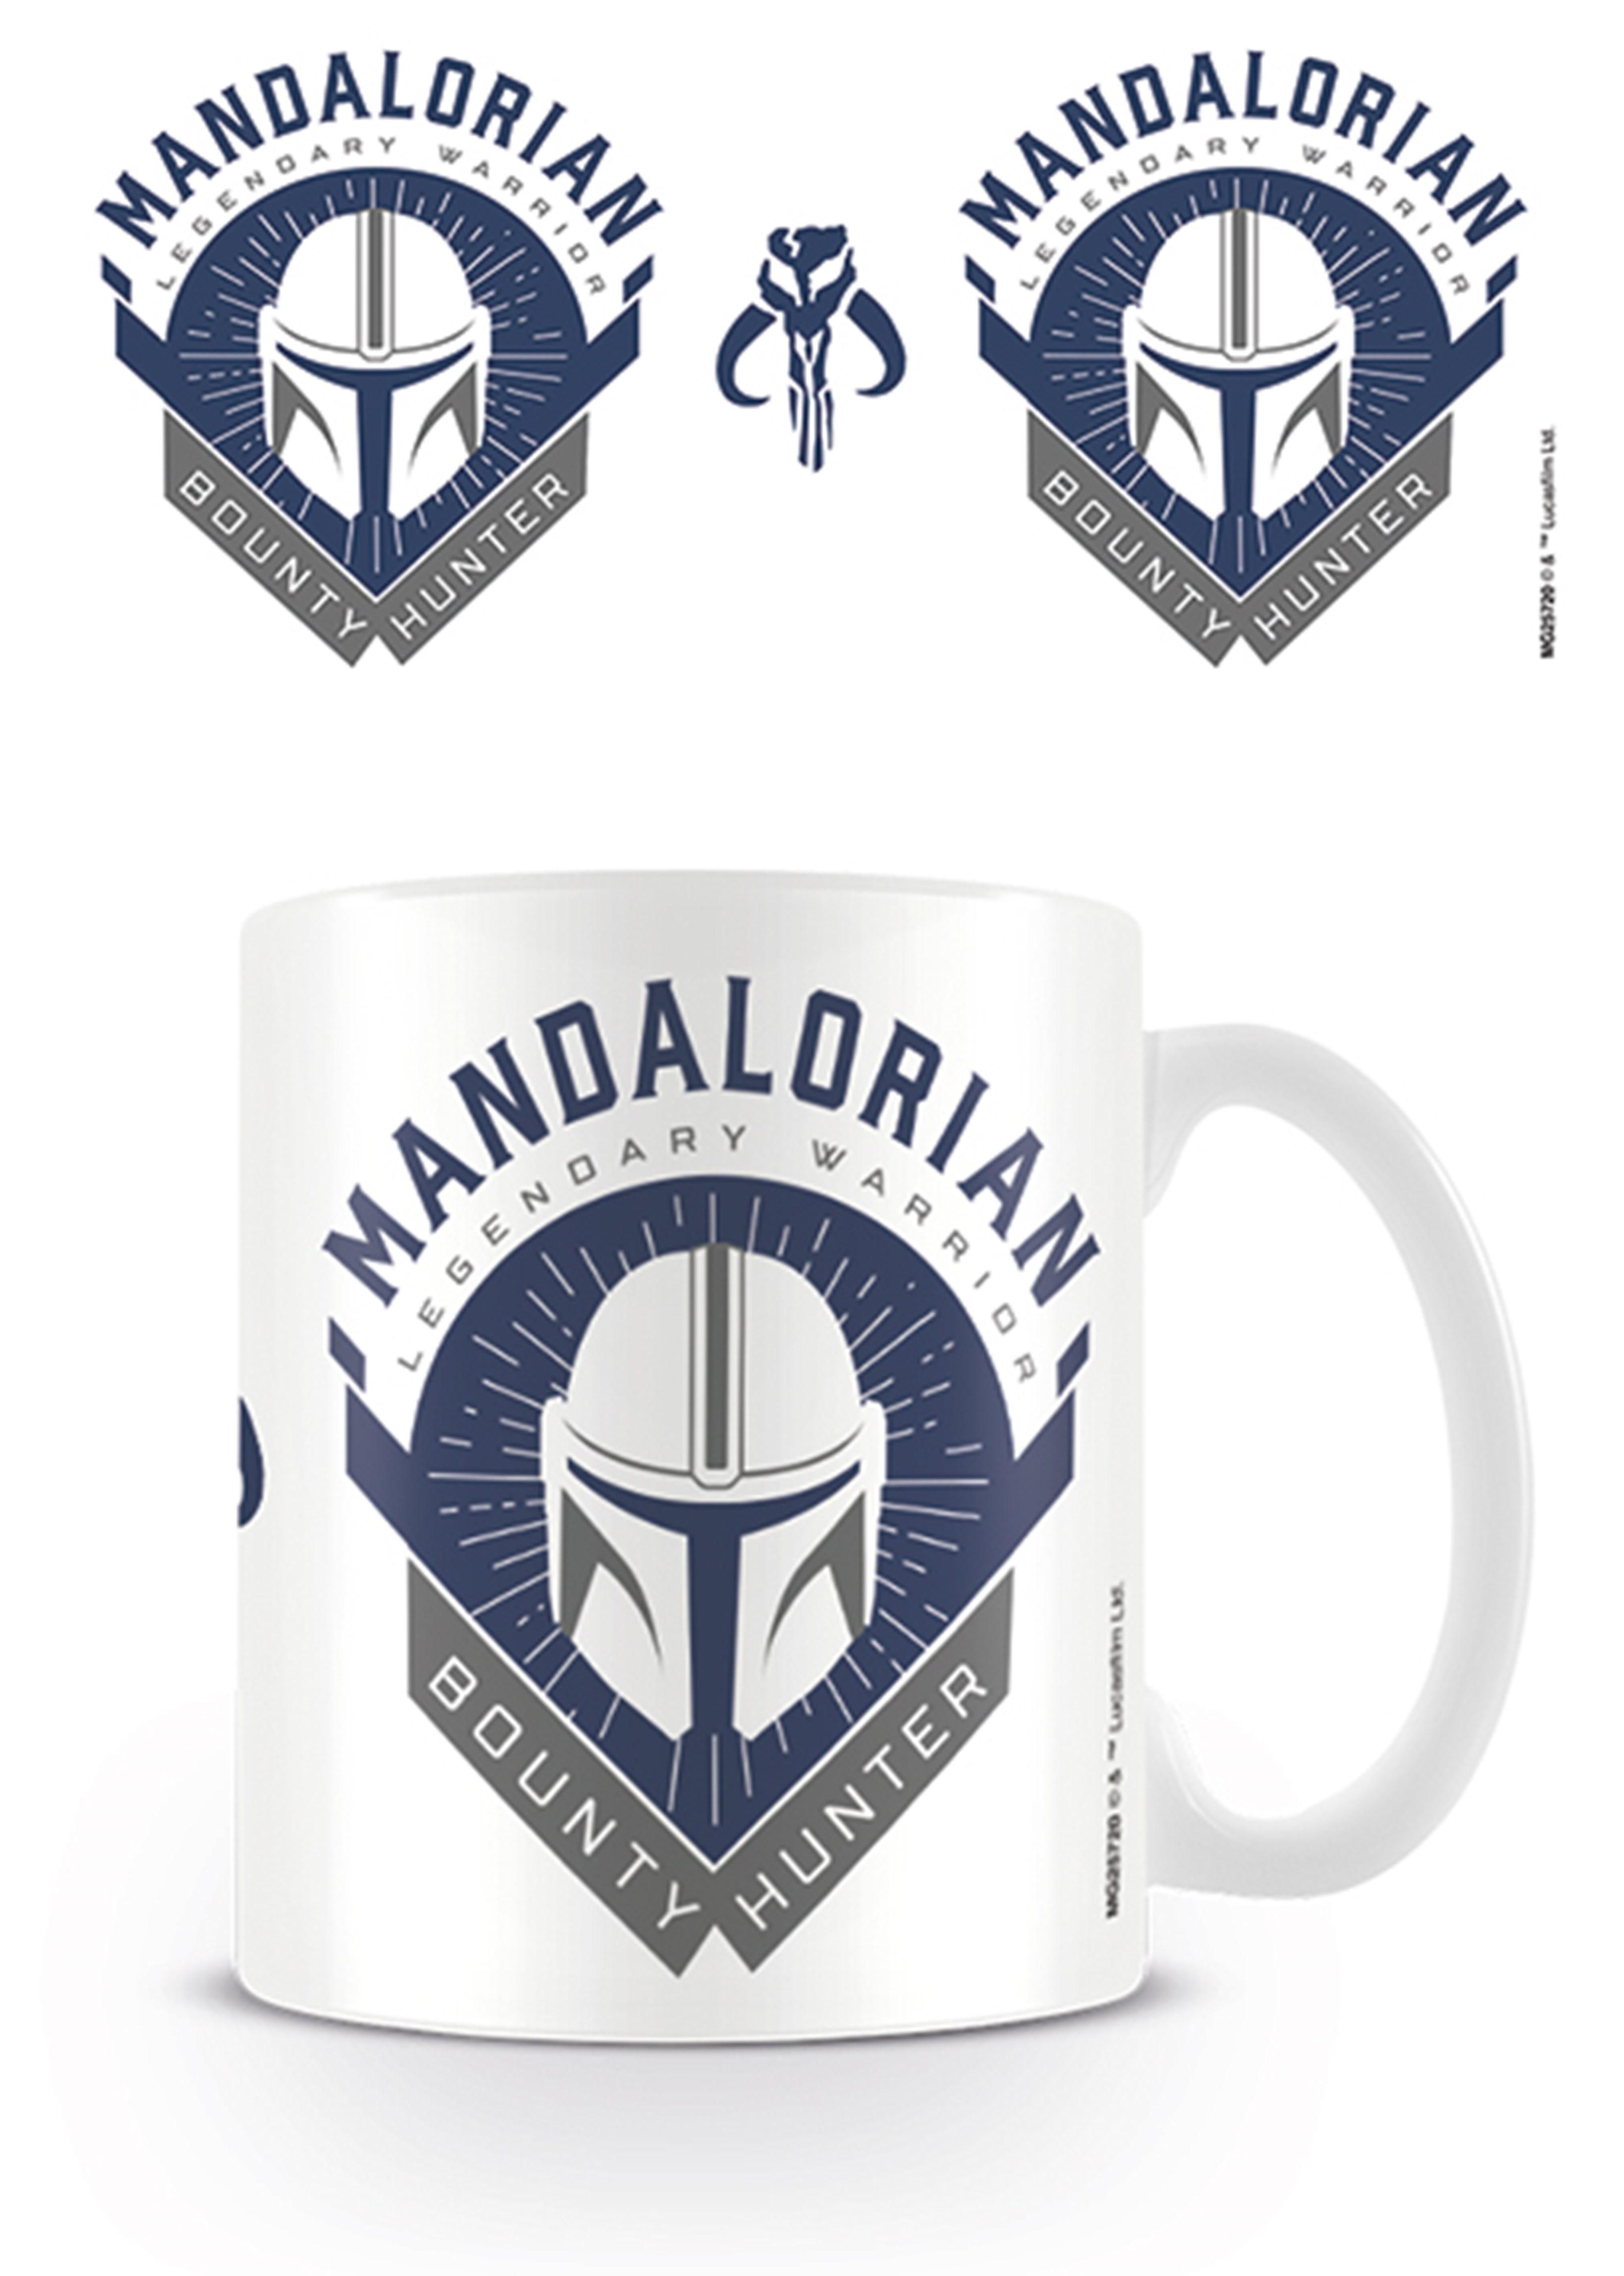 Star Wars: The Mandalorian (Bounty Hunter) Mug - 1